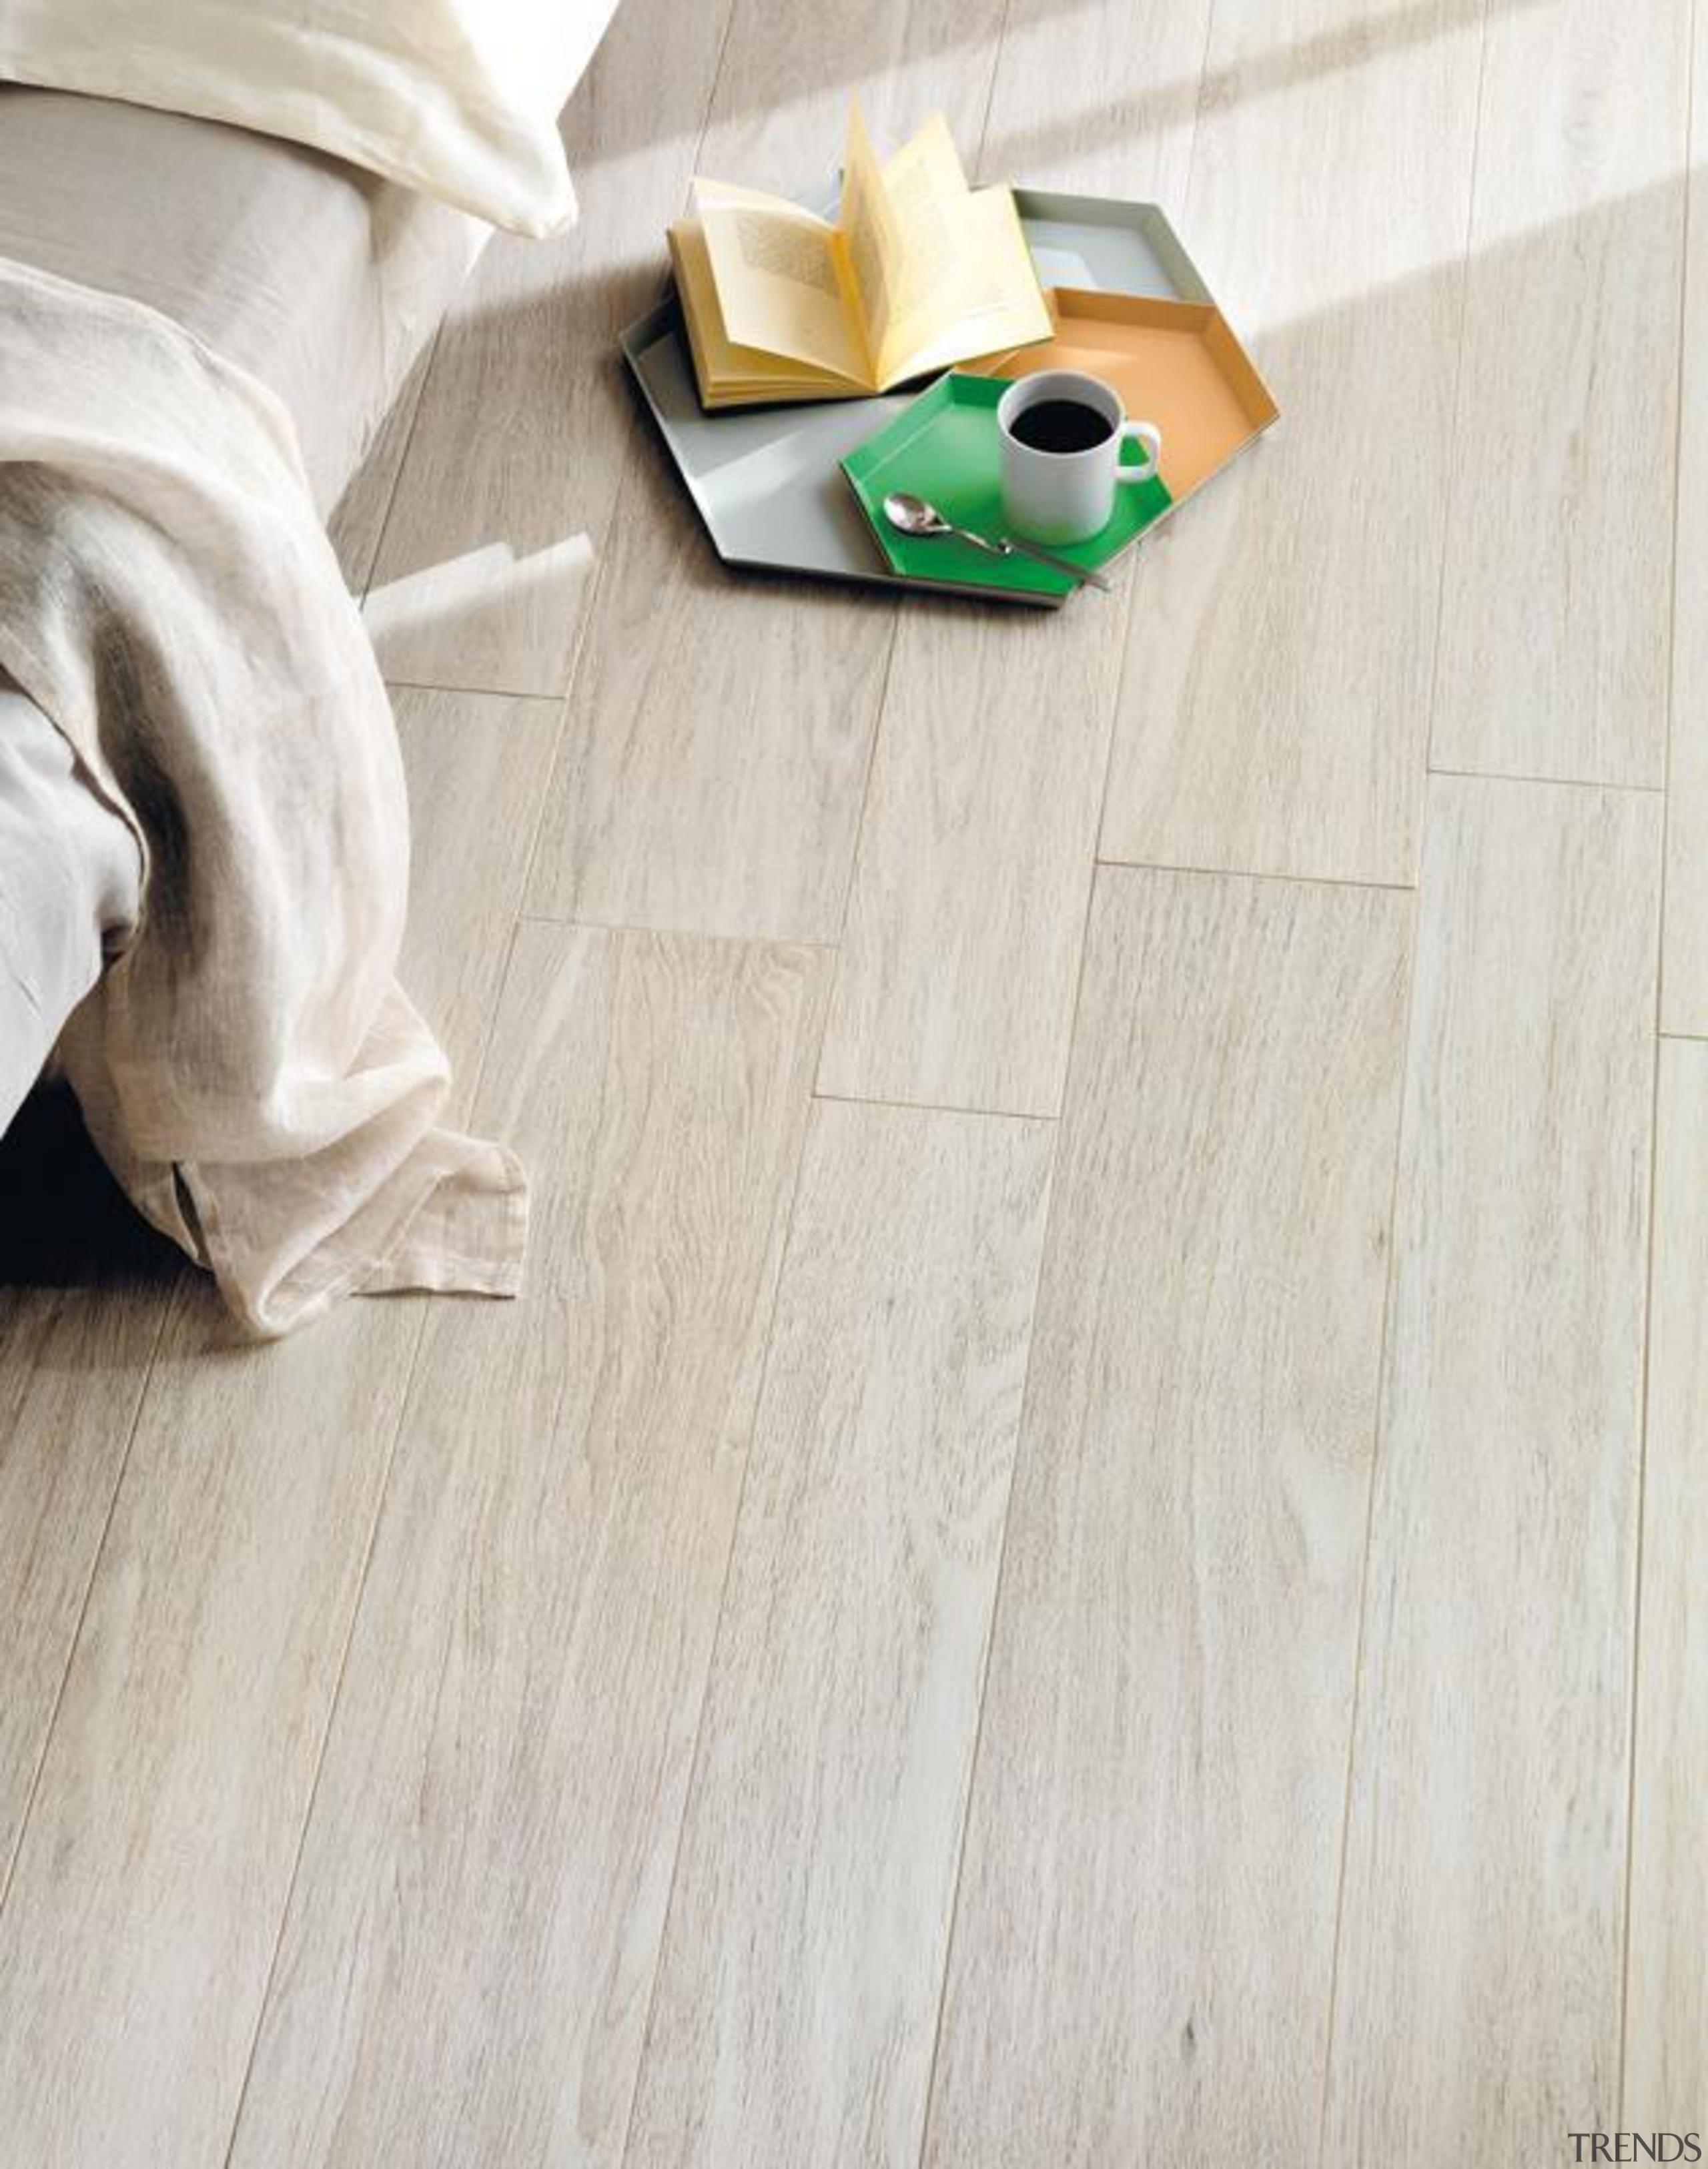 Bioplank oak ice wood look interior living room floor, flooring, hardwood, laminate flooring, product design, tile, wood, wood flooring, wood stain, white